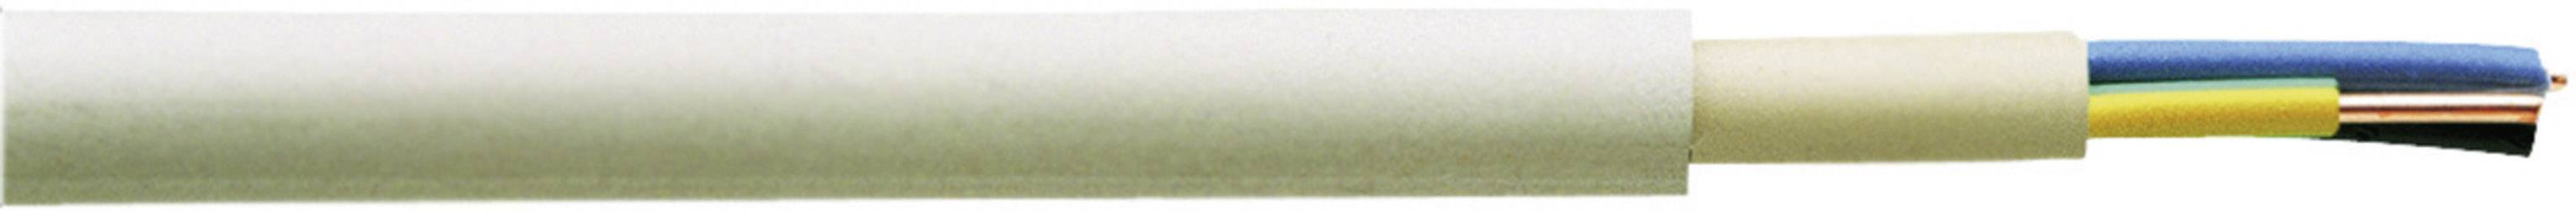 Opláštený kábel Faber Kabel NYM-J 020009, 3 G 2.50 mm², 50 m, sivá